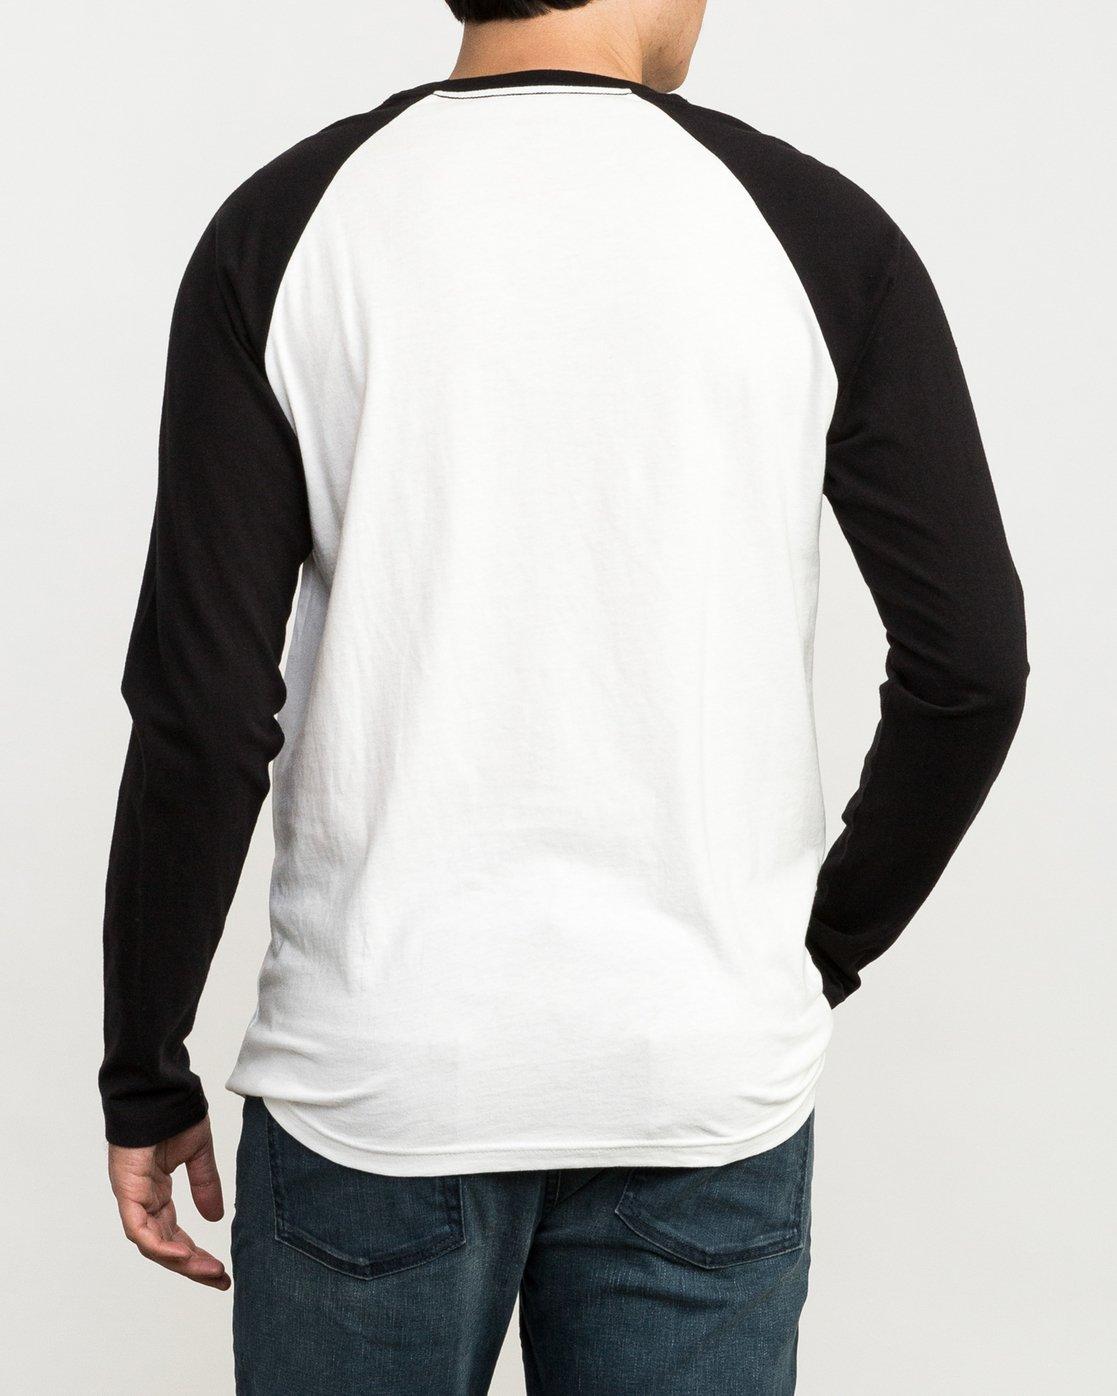 4 Looped T-Shirt Black M454QRLO RVCA